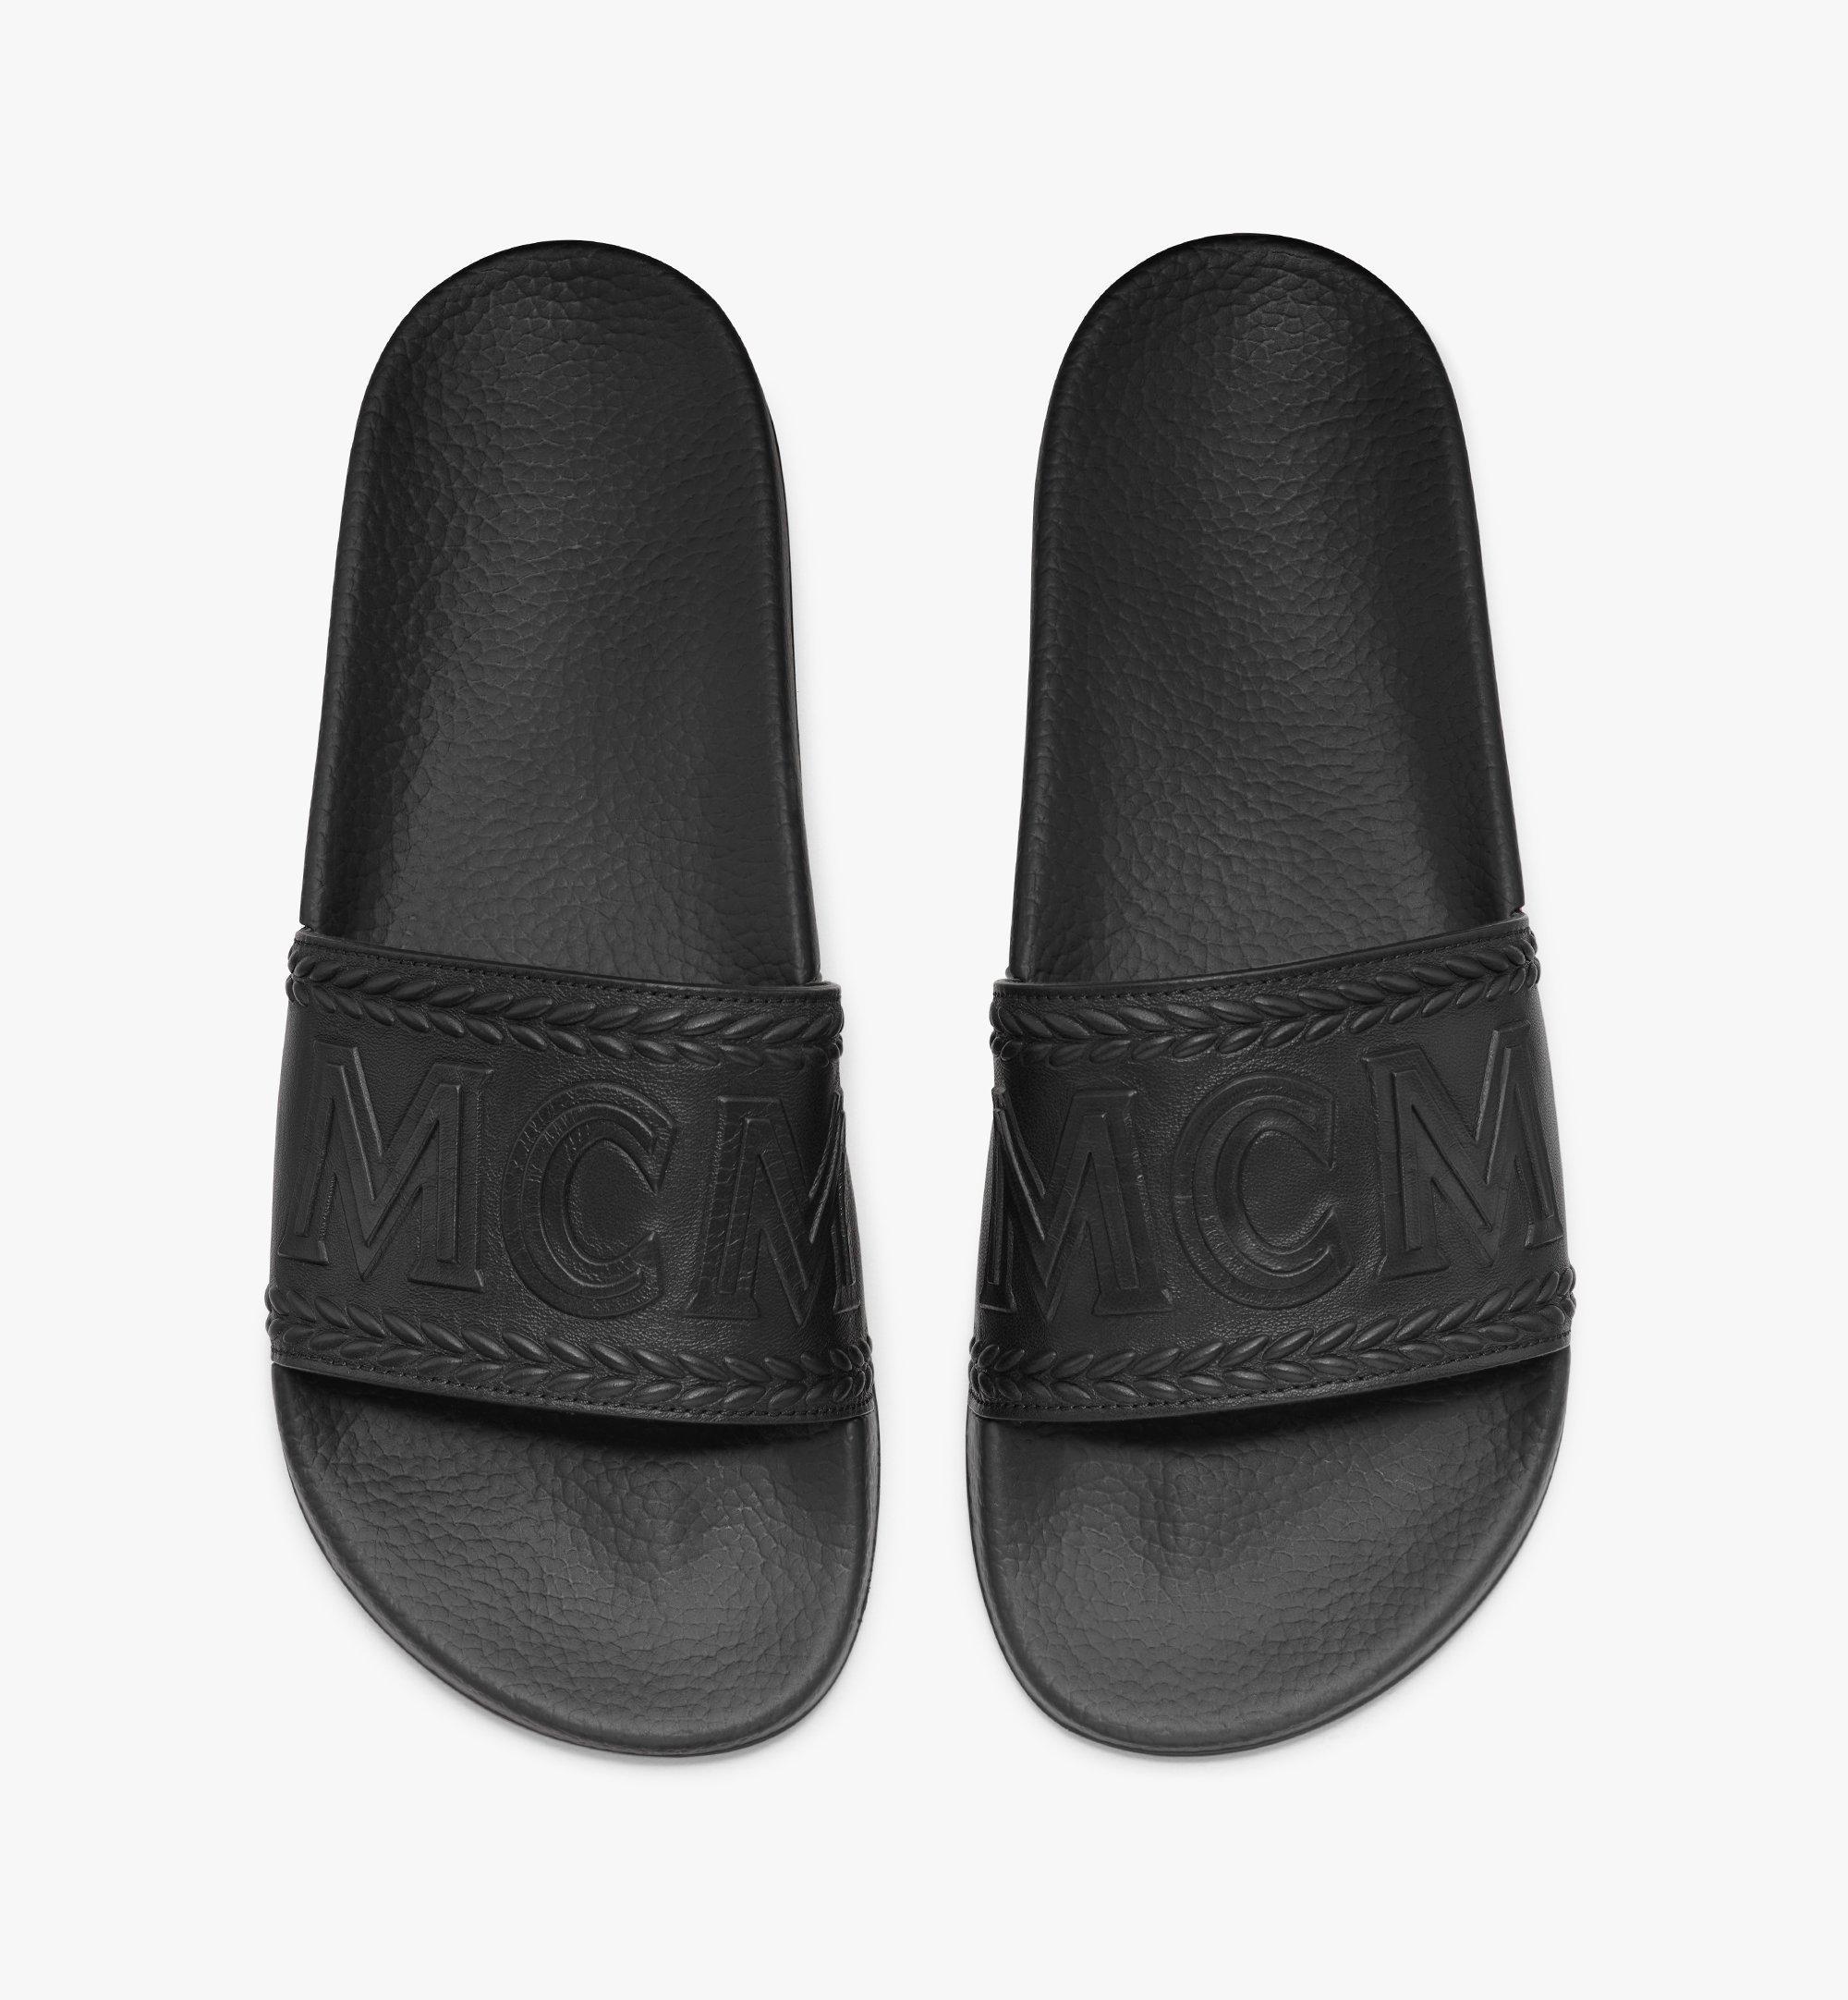 MCM 男士Big Logo拖鞋 Black MEXASMM21BK041 更多视角 4